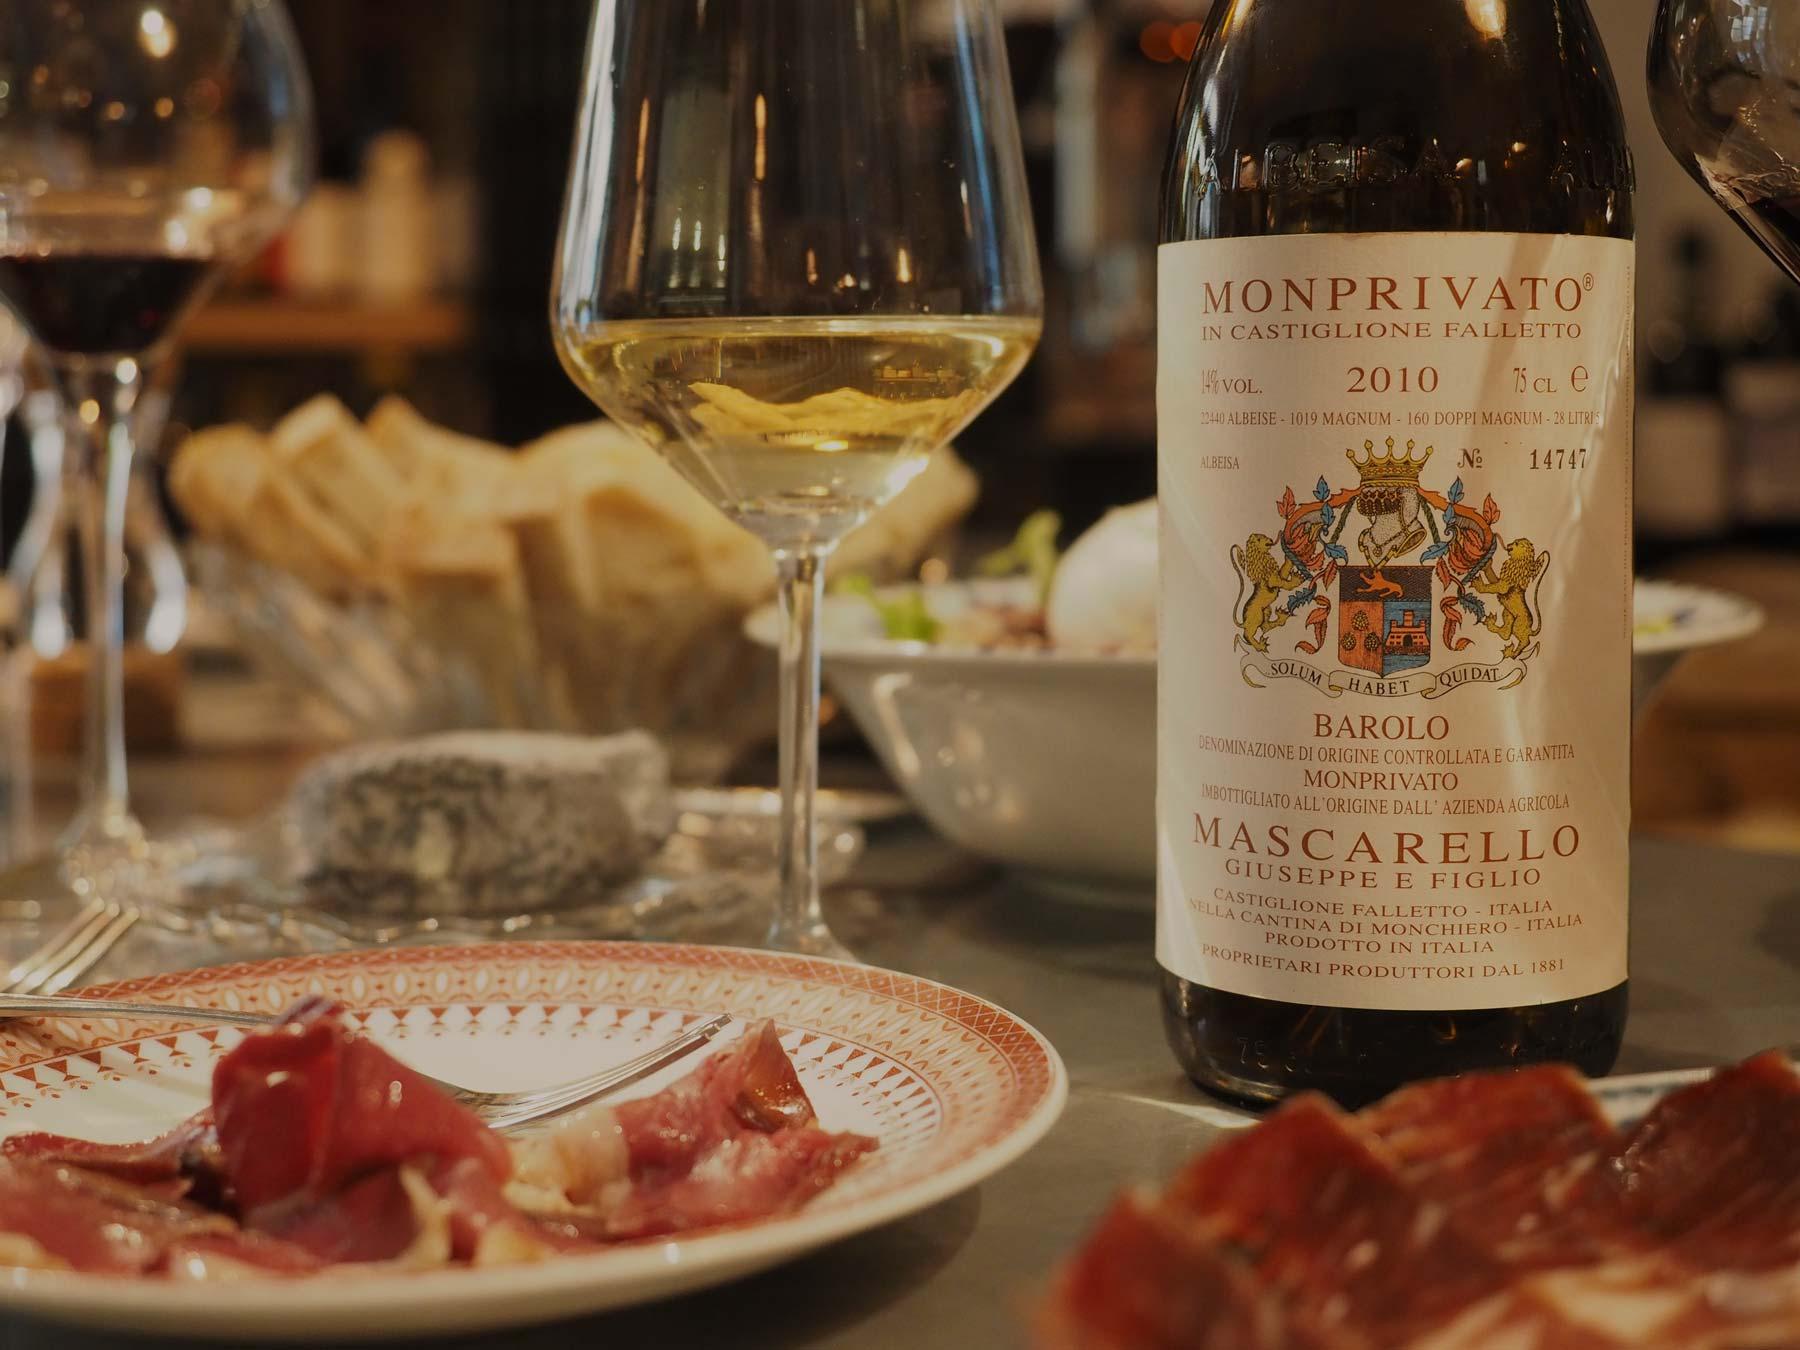 Enoteca al Risanamento Bologna wine shop